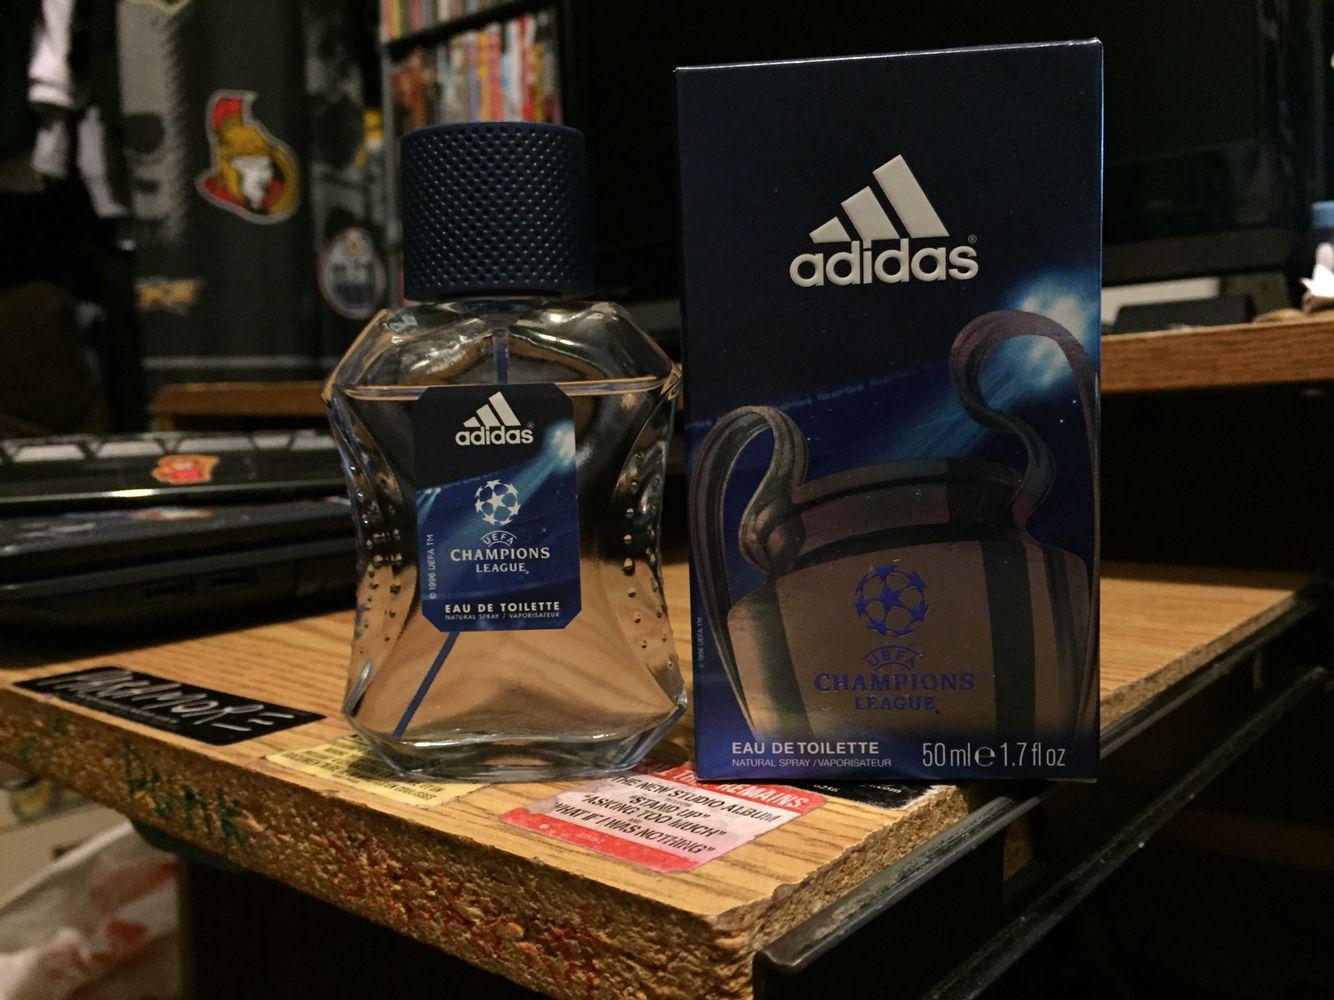 raíz Viaje adherirse  Adidas UEFA Champions League eau de toilette natural spray   Eau de toilette,  Body spray, Perfume bottles